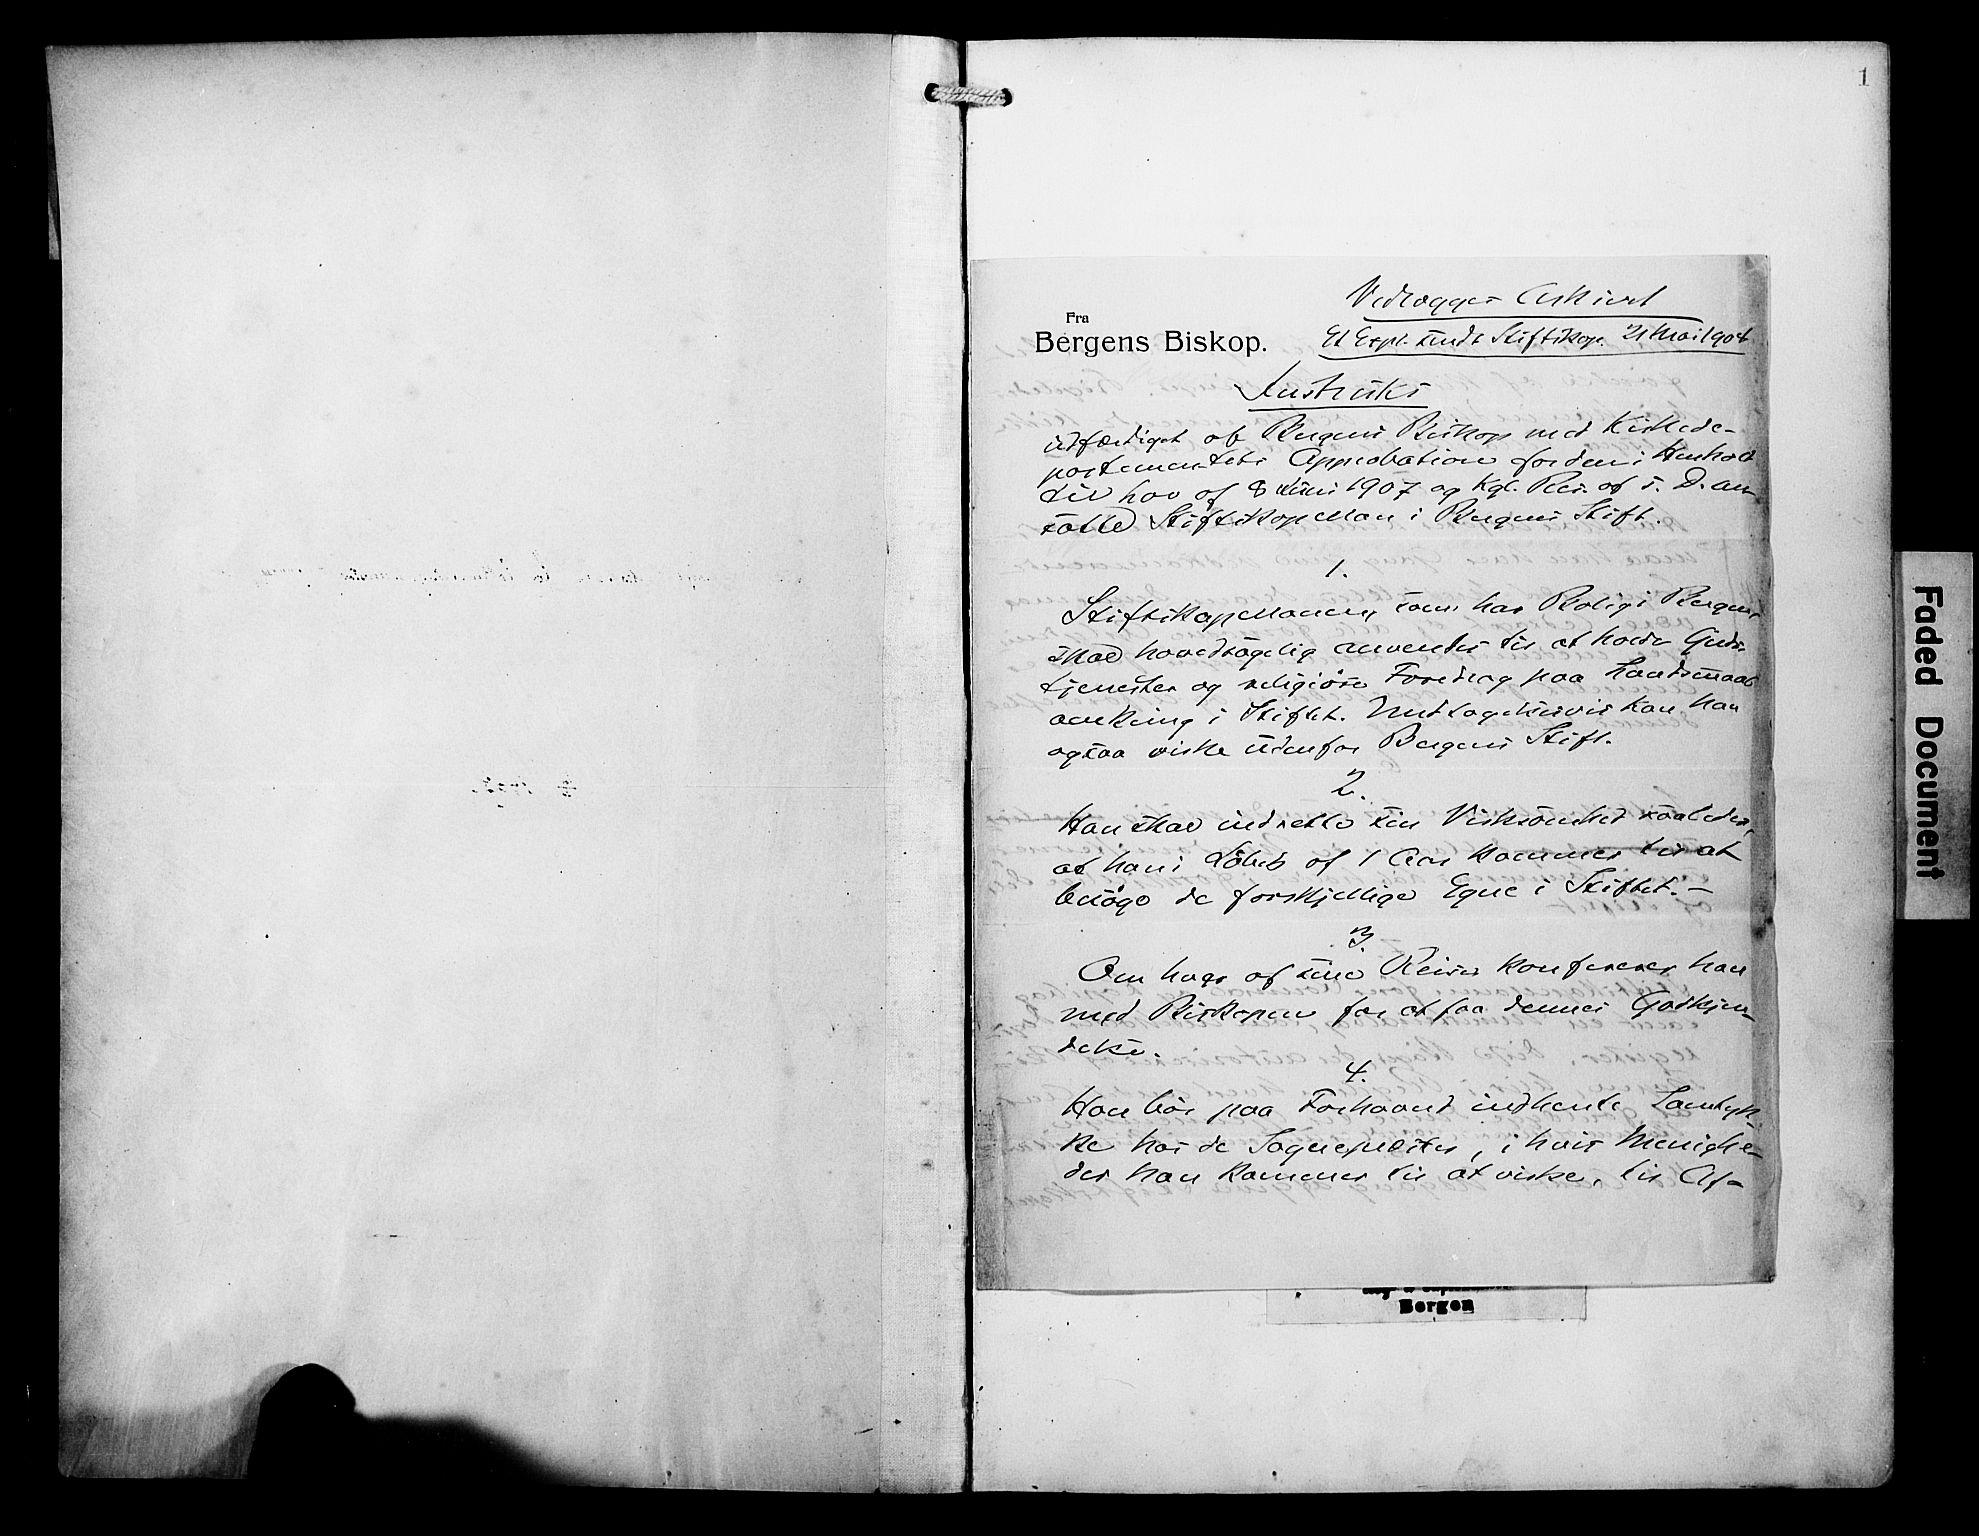 SAB, Arkivreferanse mangler*, Ministerialbok nr. A 1, 1907-1928, s. 1